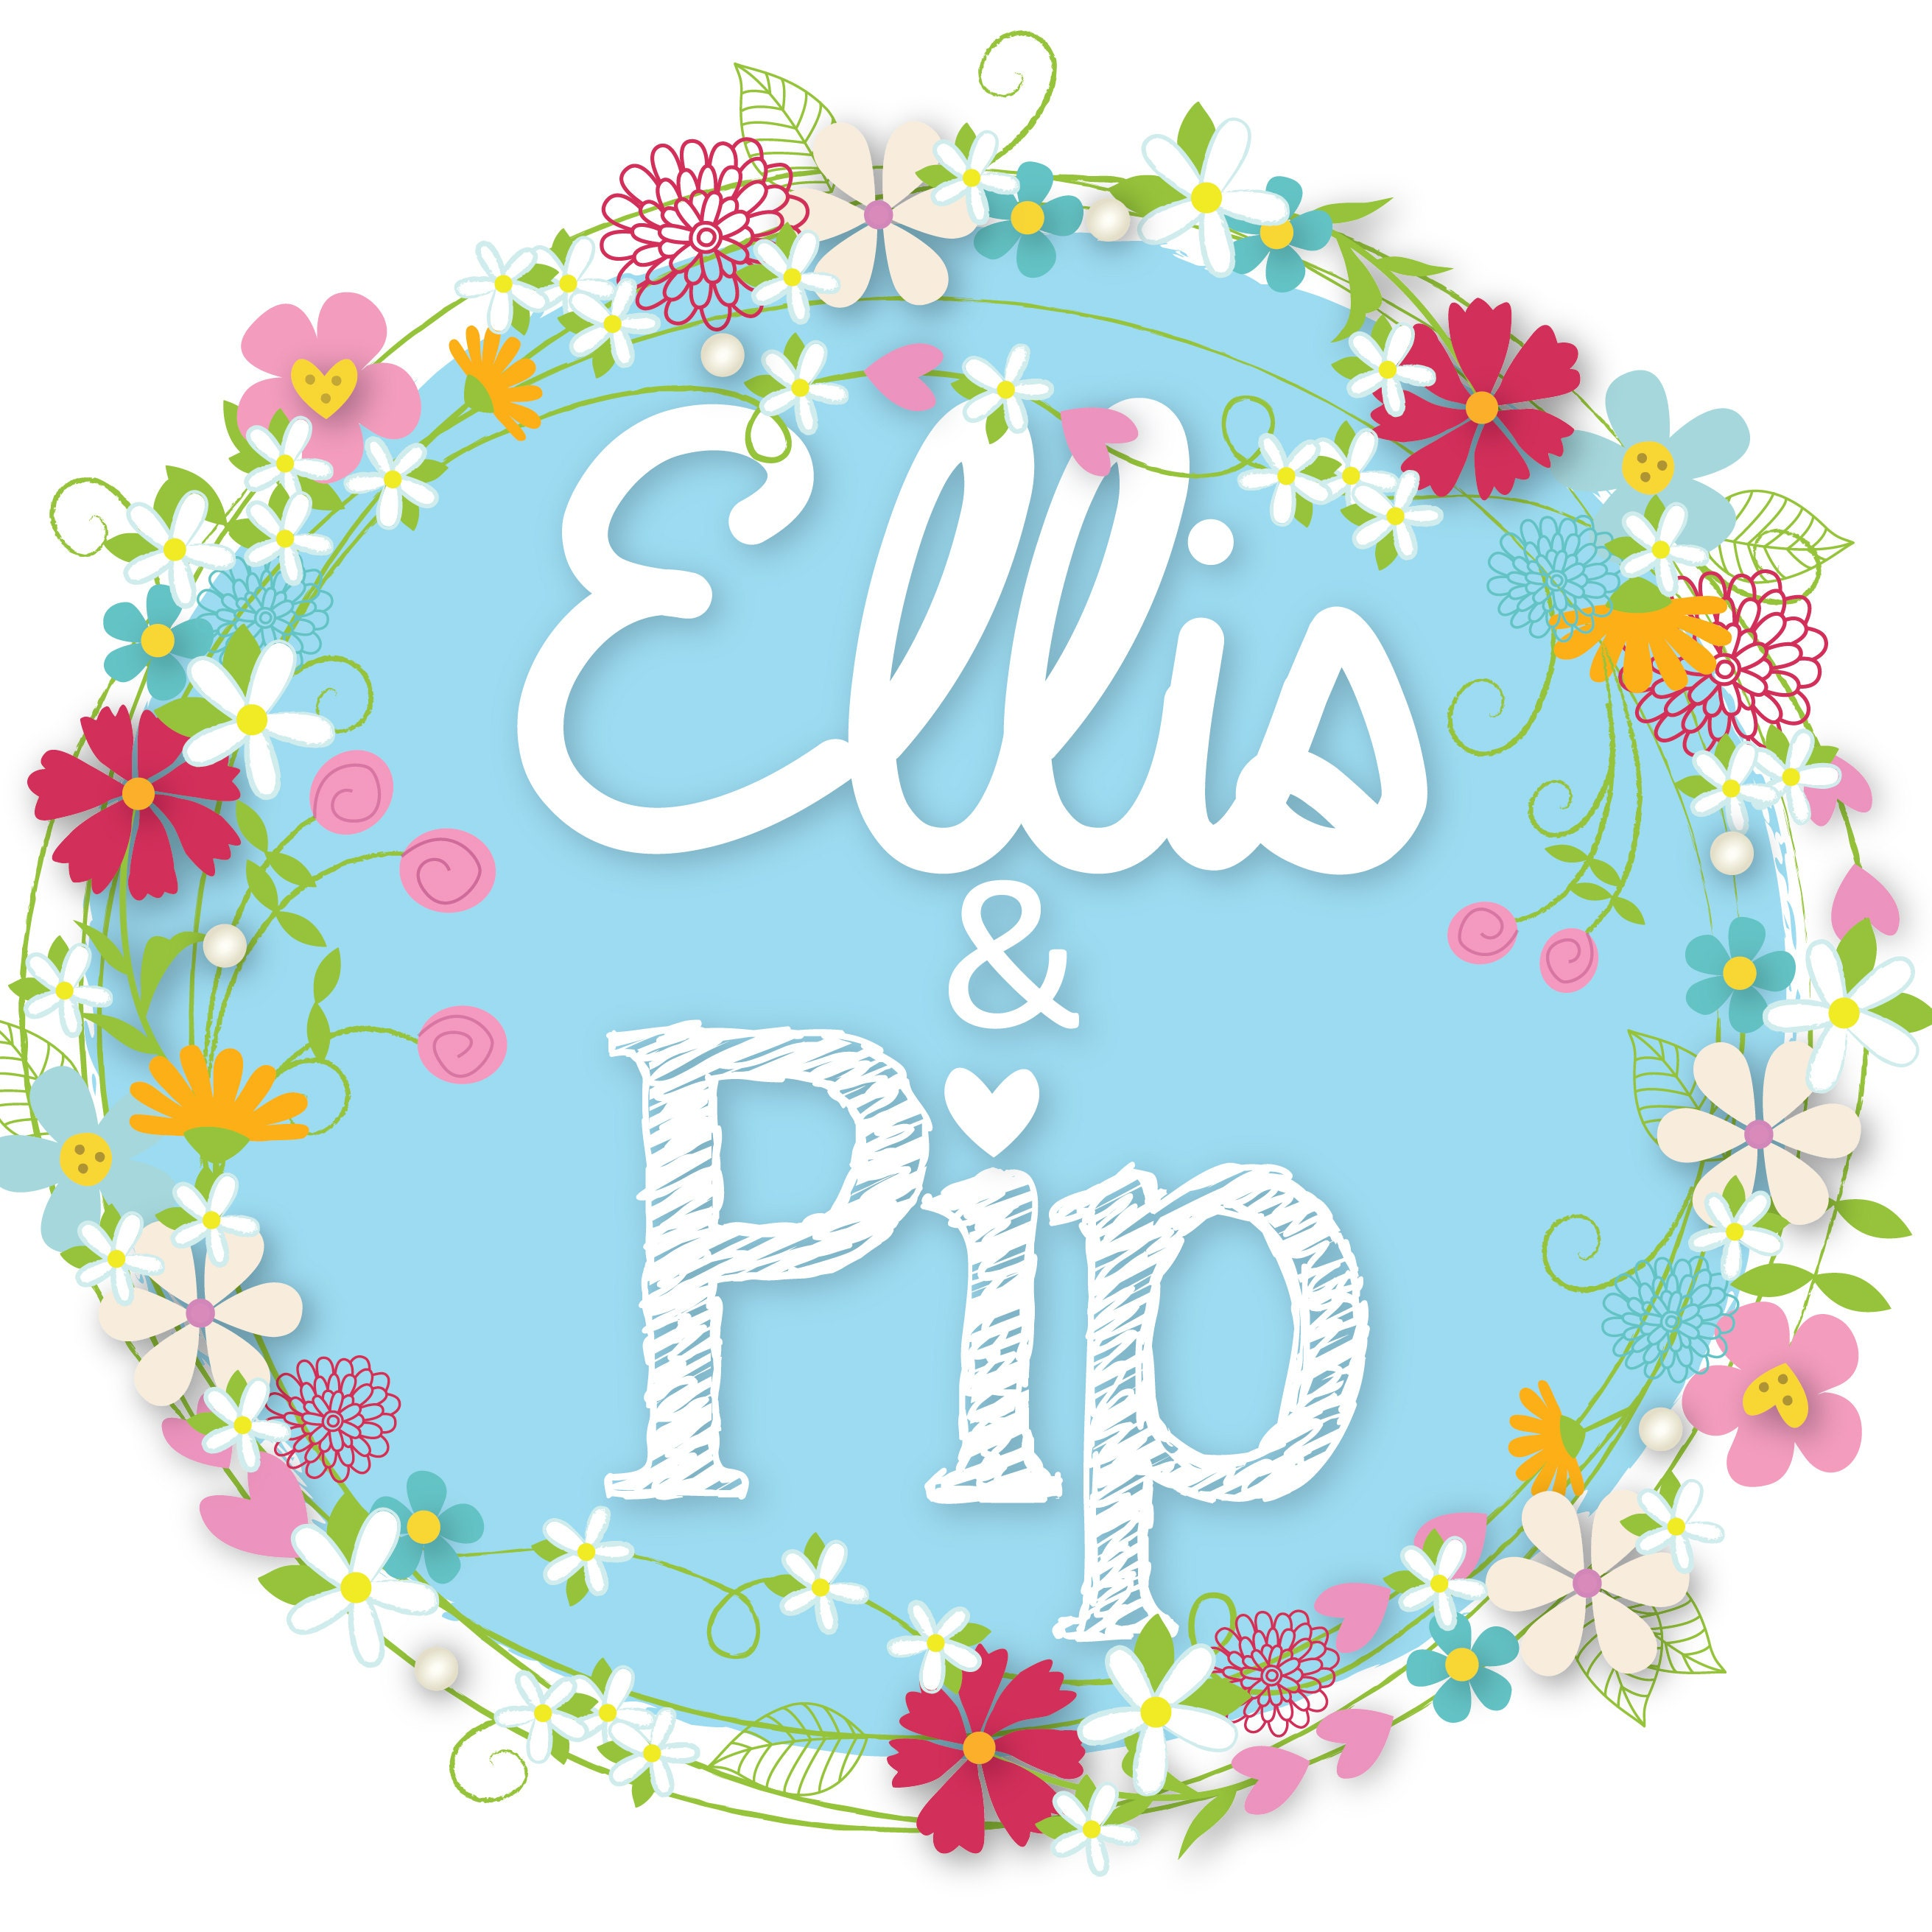 EllisAndPip